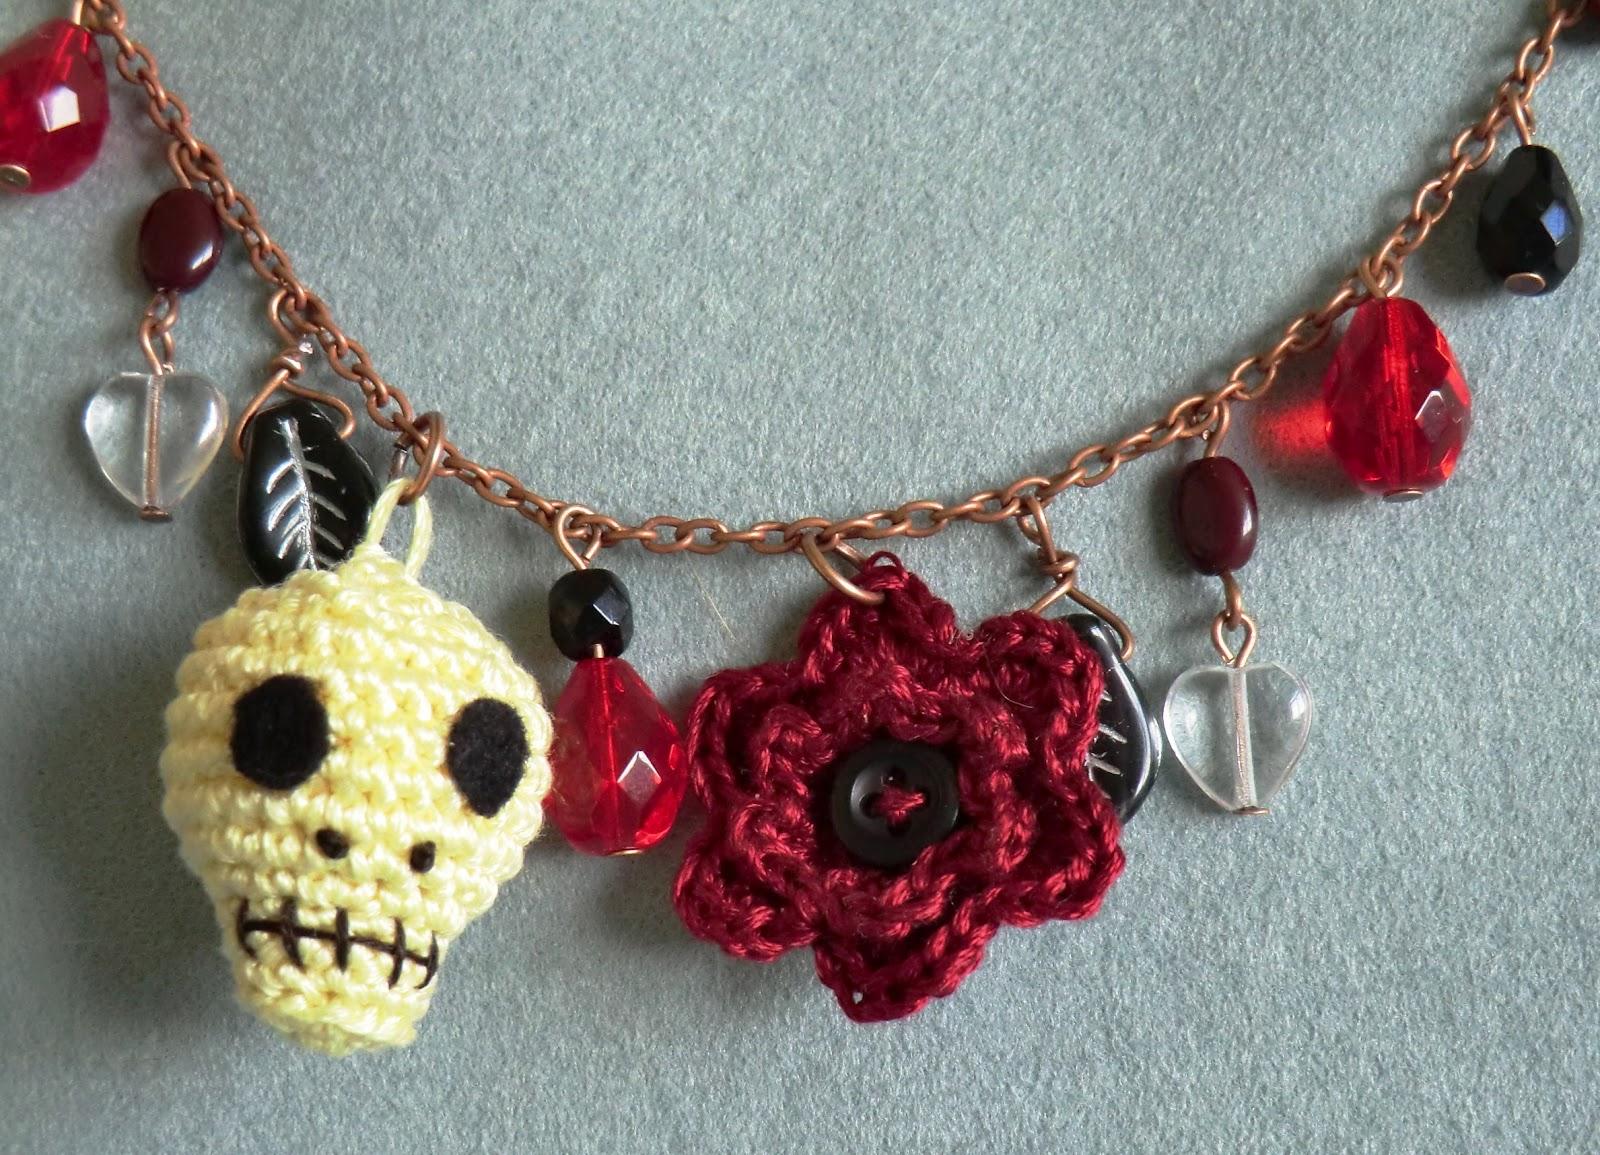 Free Amigurumi Skull Pattern : Amigurumi Barmy: Skull bracelet